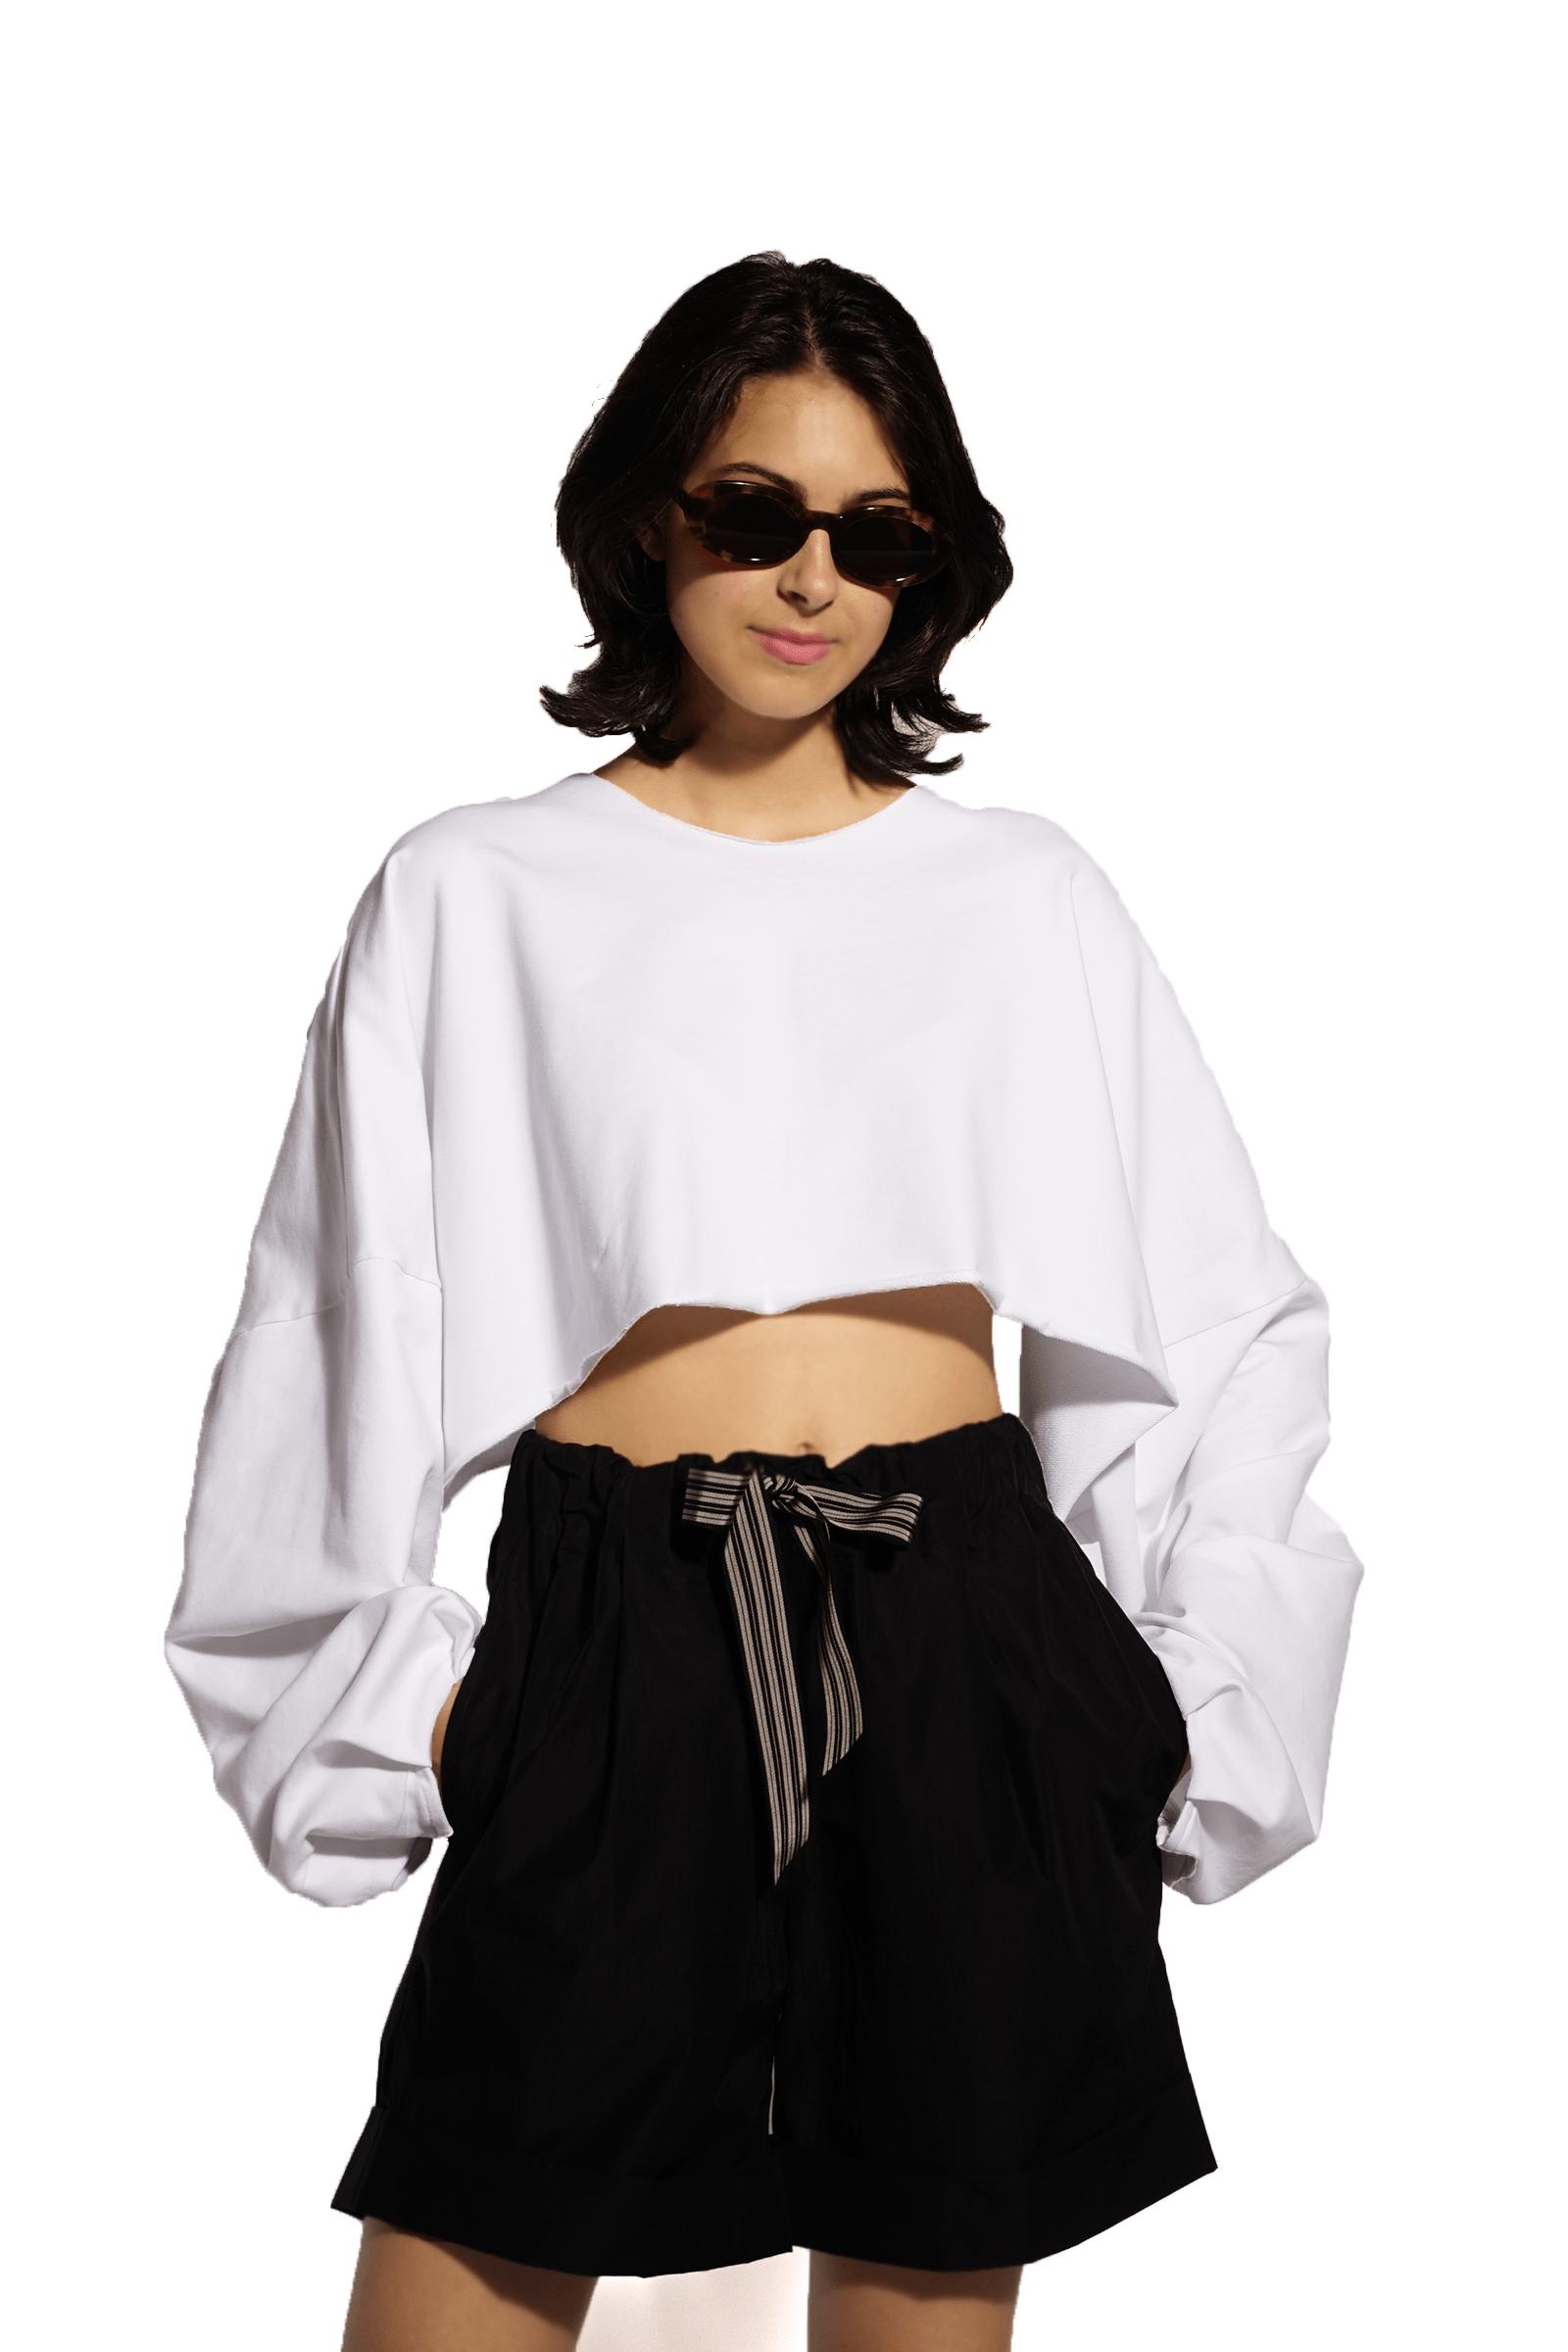 Short white top